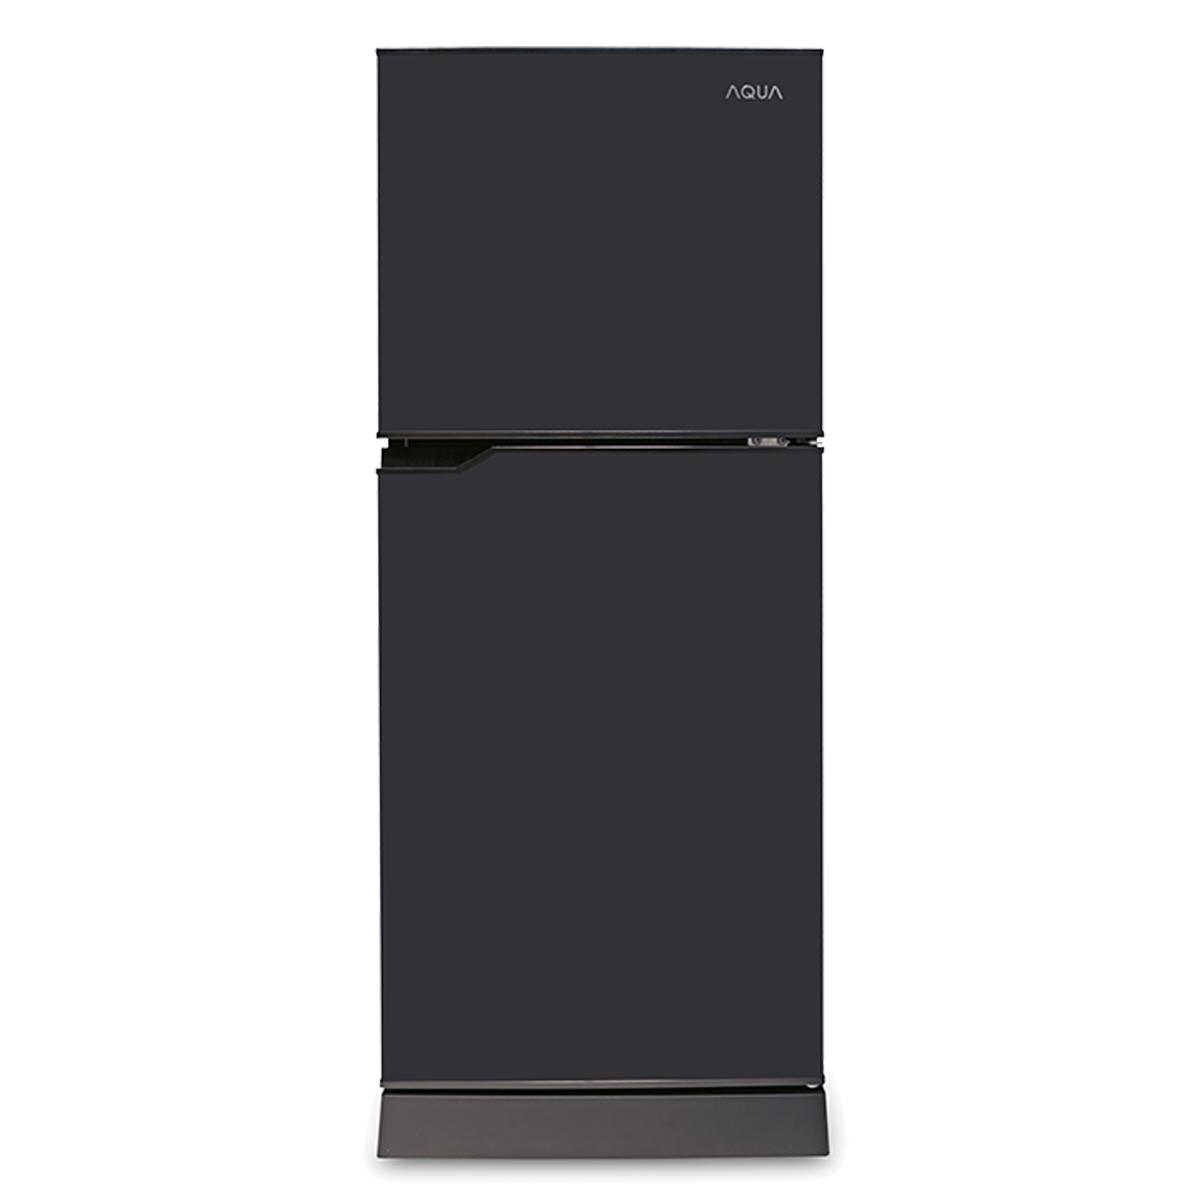 Đánh giá Tủ Lạnh Aqua AQR-T150FA-BS (130L)